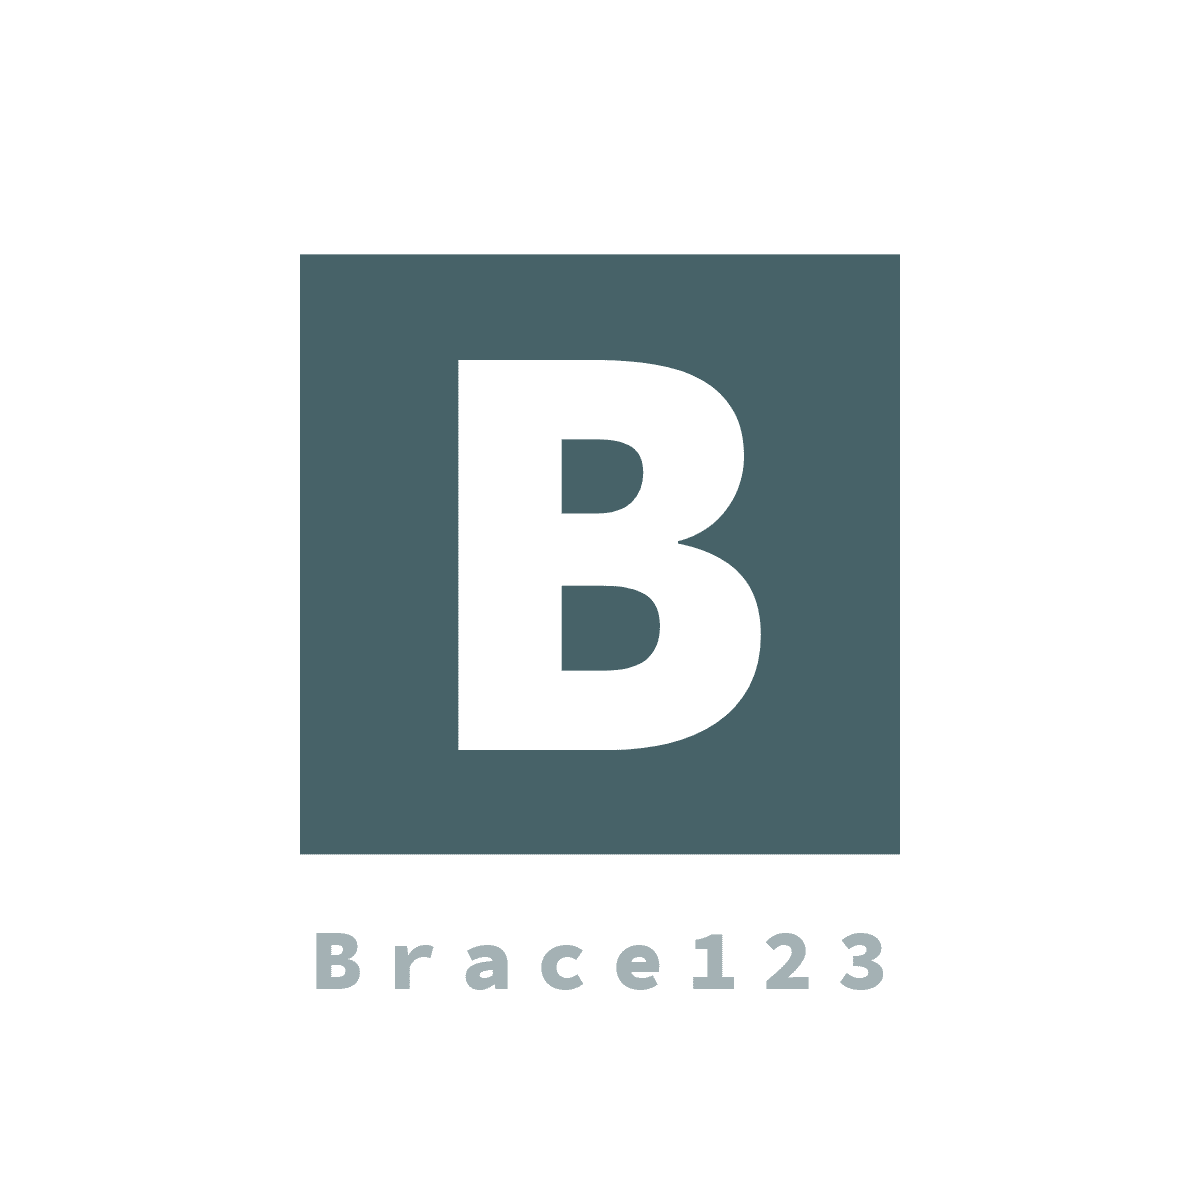 BRACE123